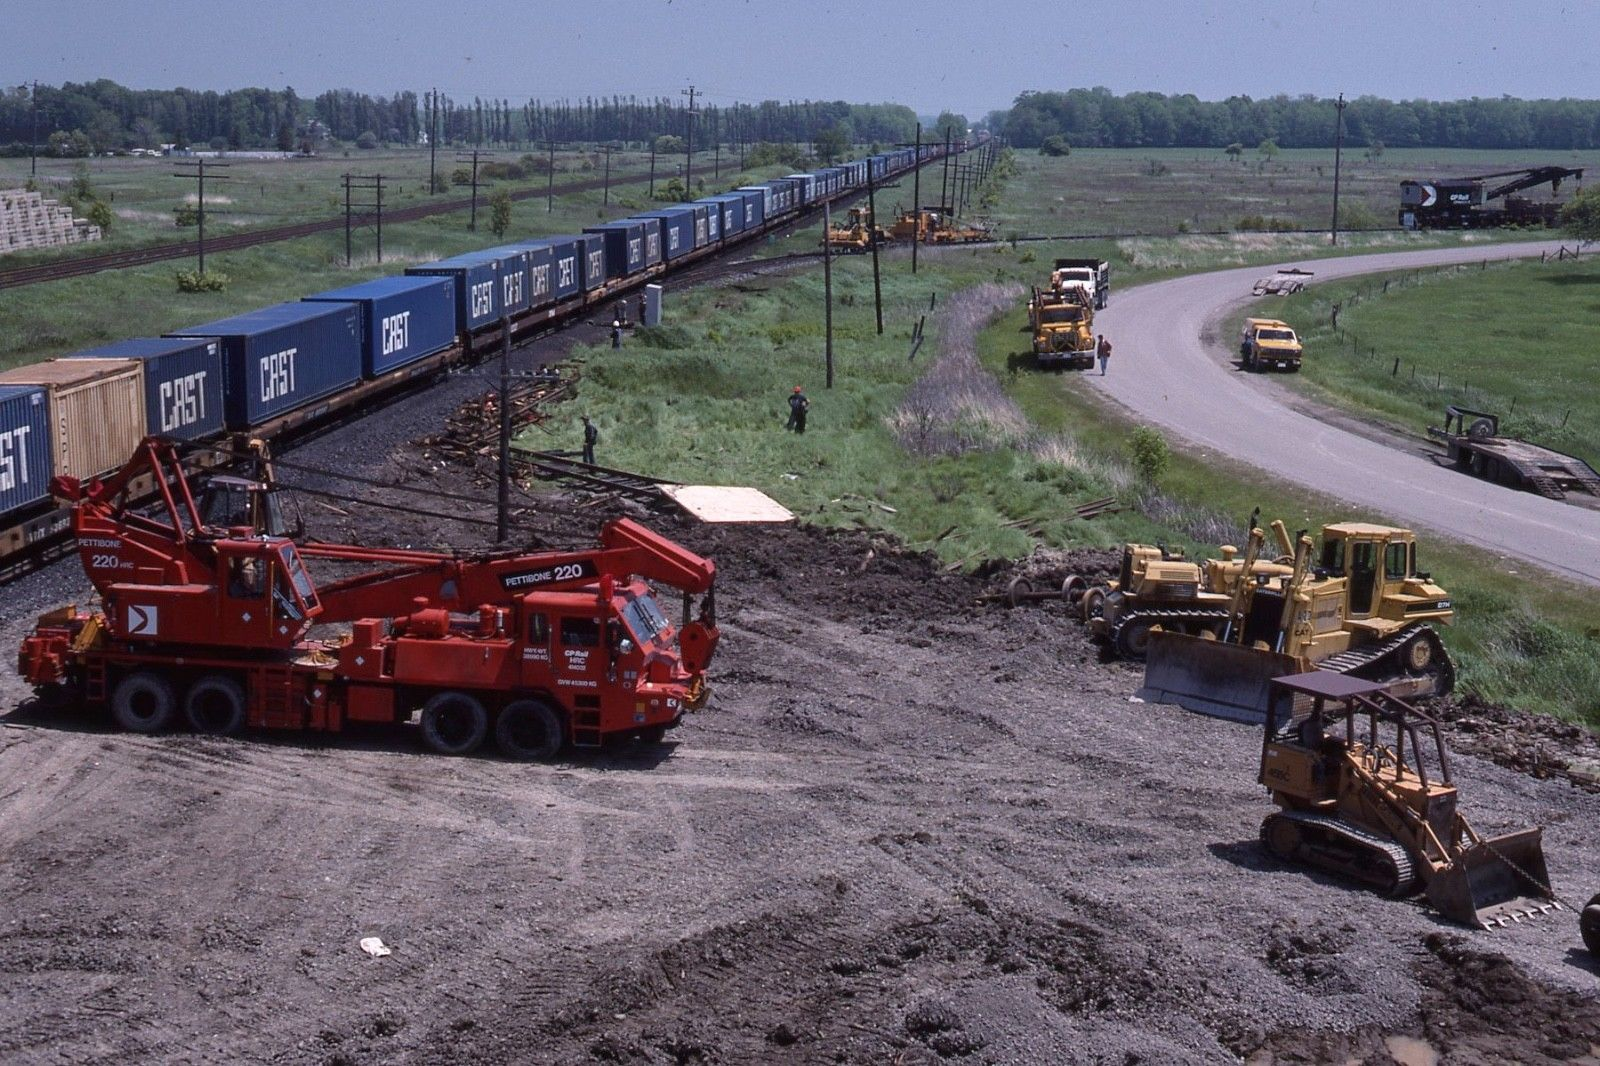 PETTIBONE # CP 220 AT COBOURG, ONTARIO JUNE 1989. | On Company ...